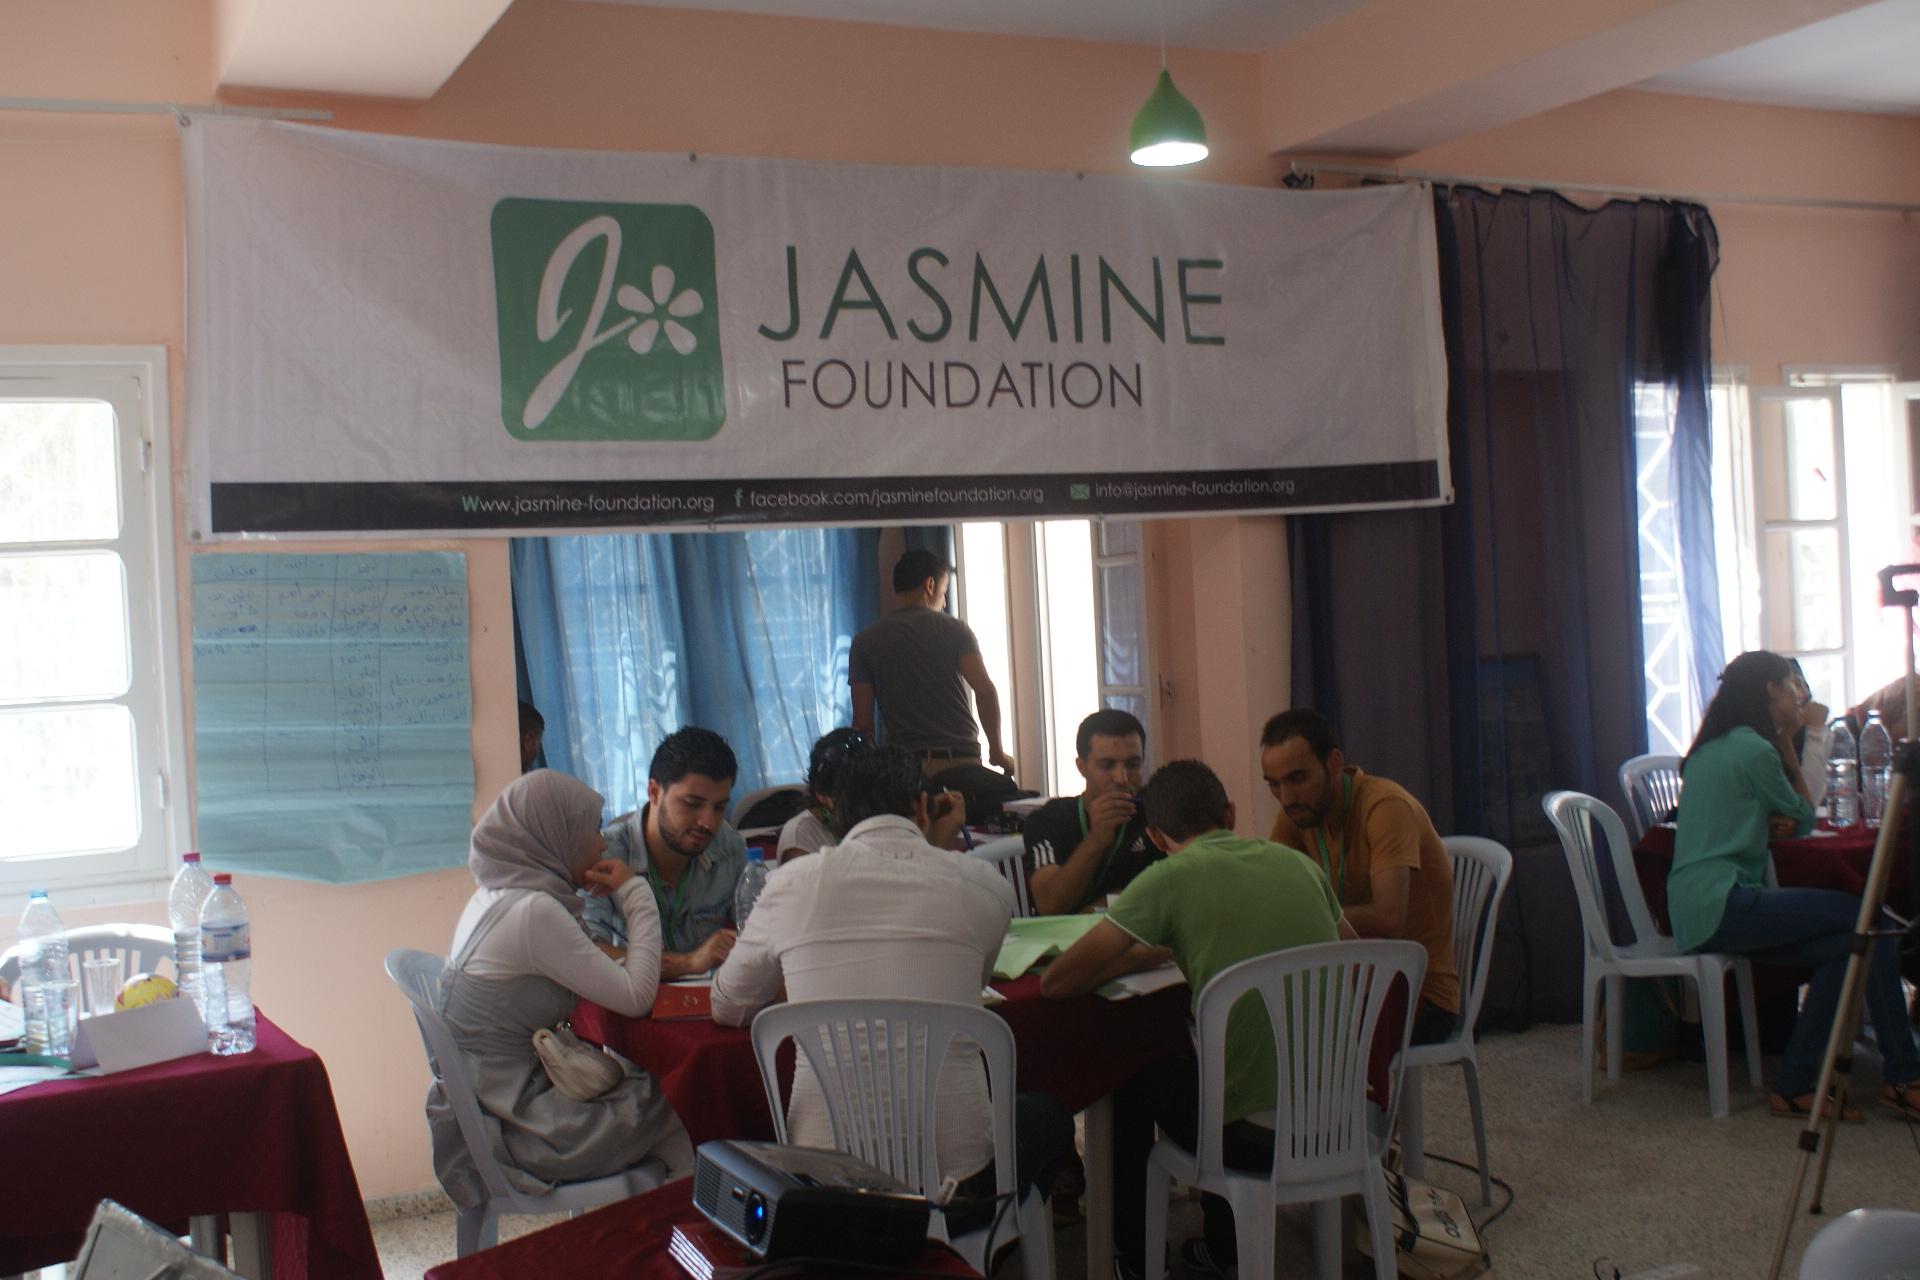 Jasmine Foundation 2